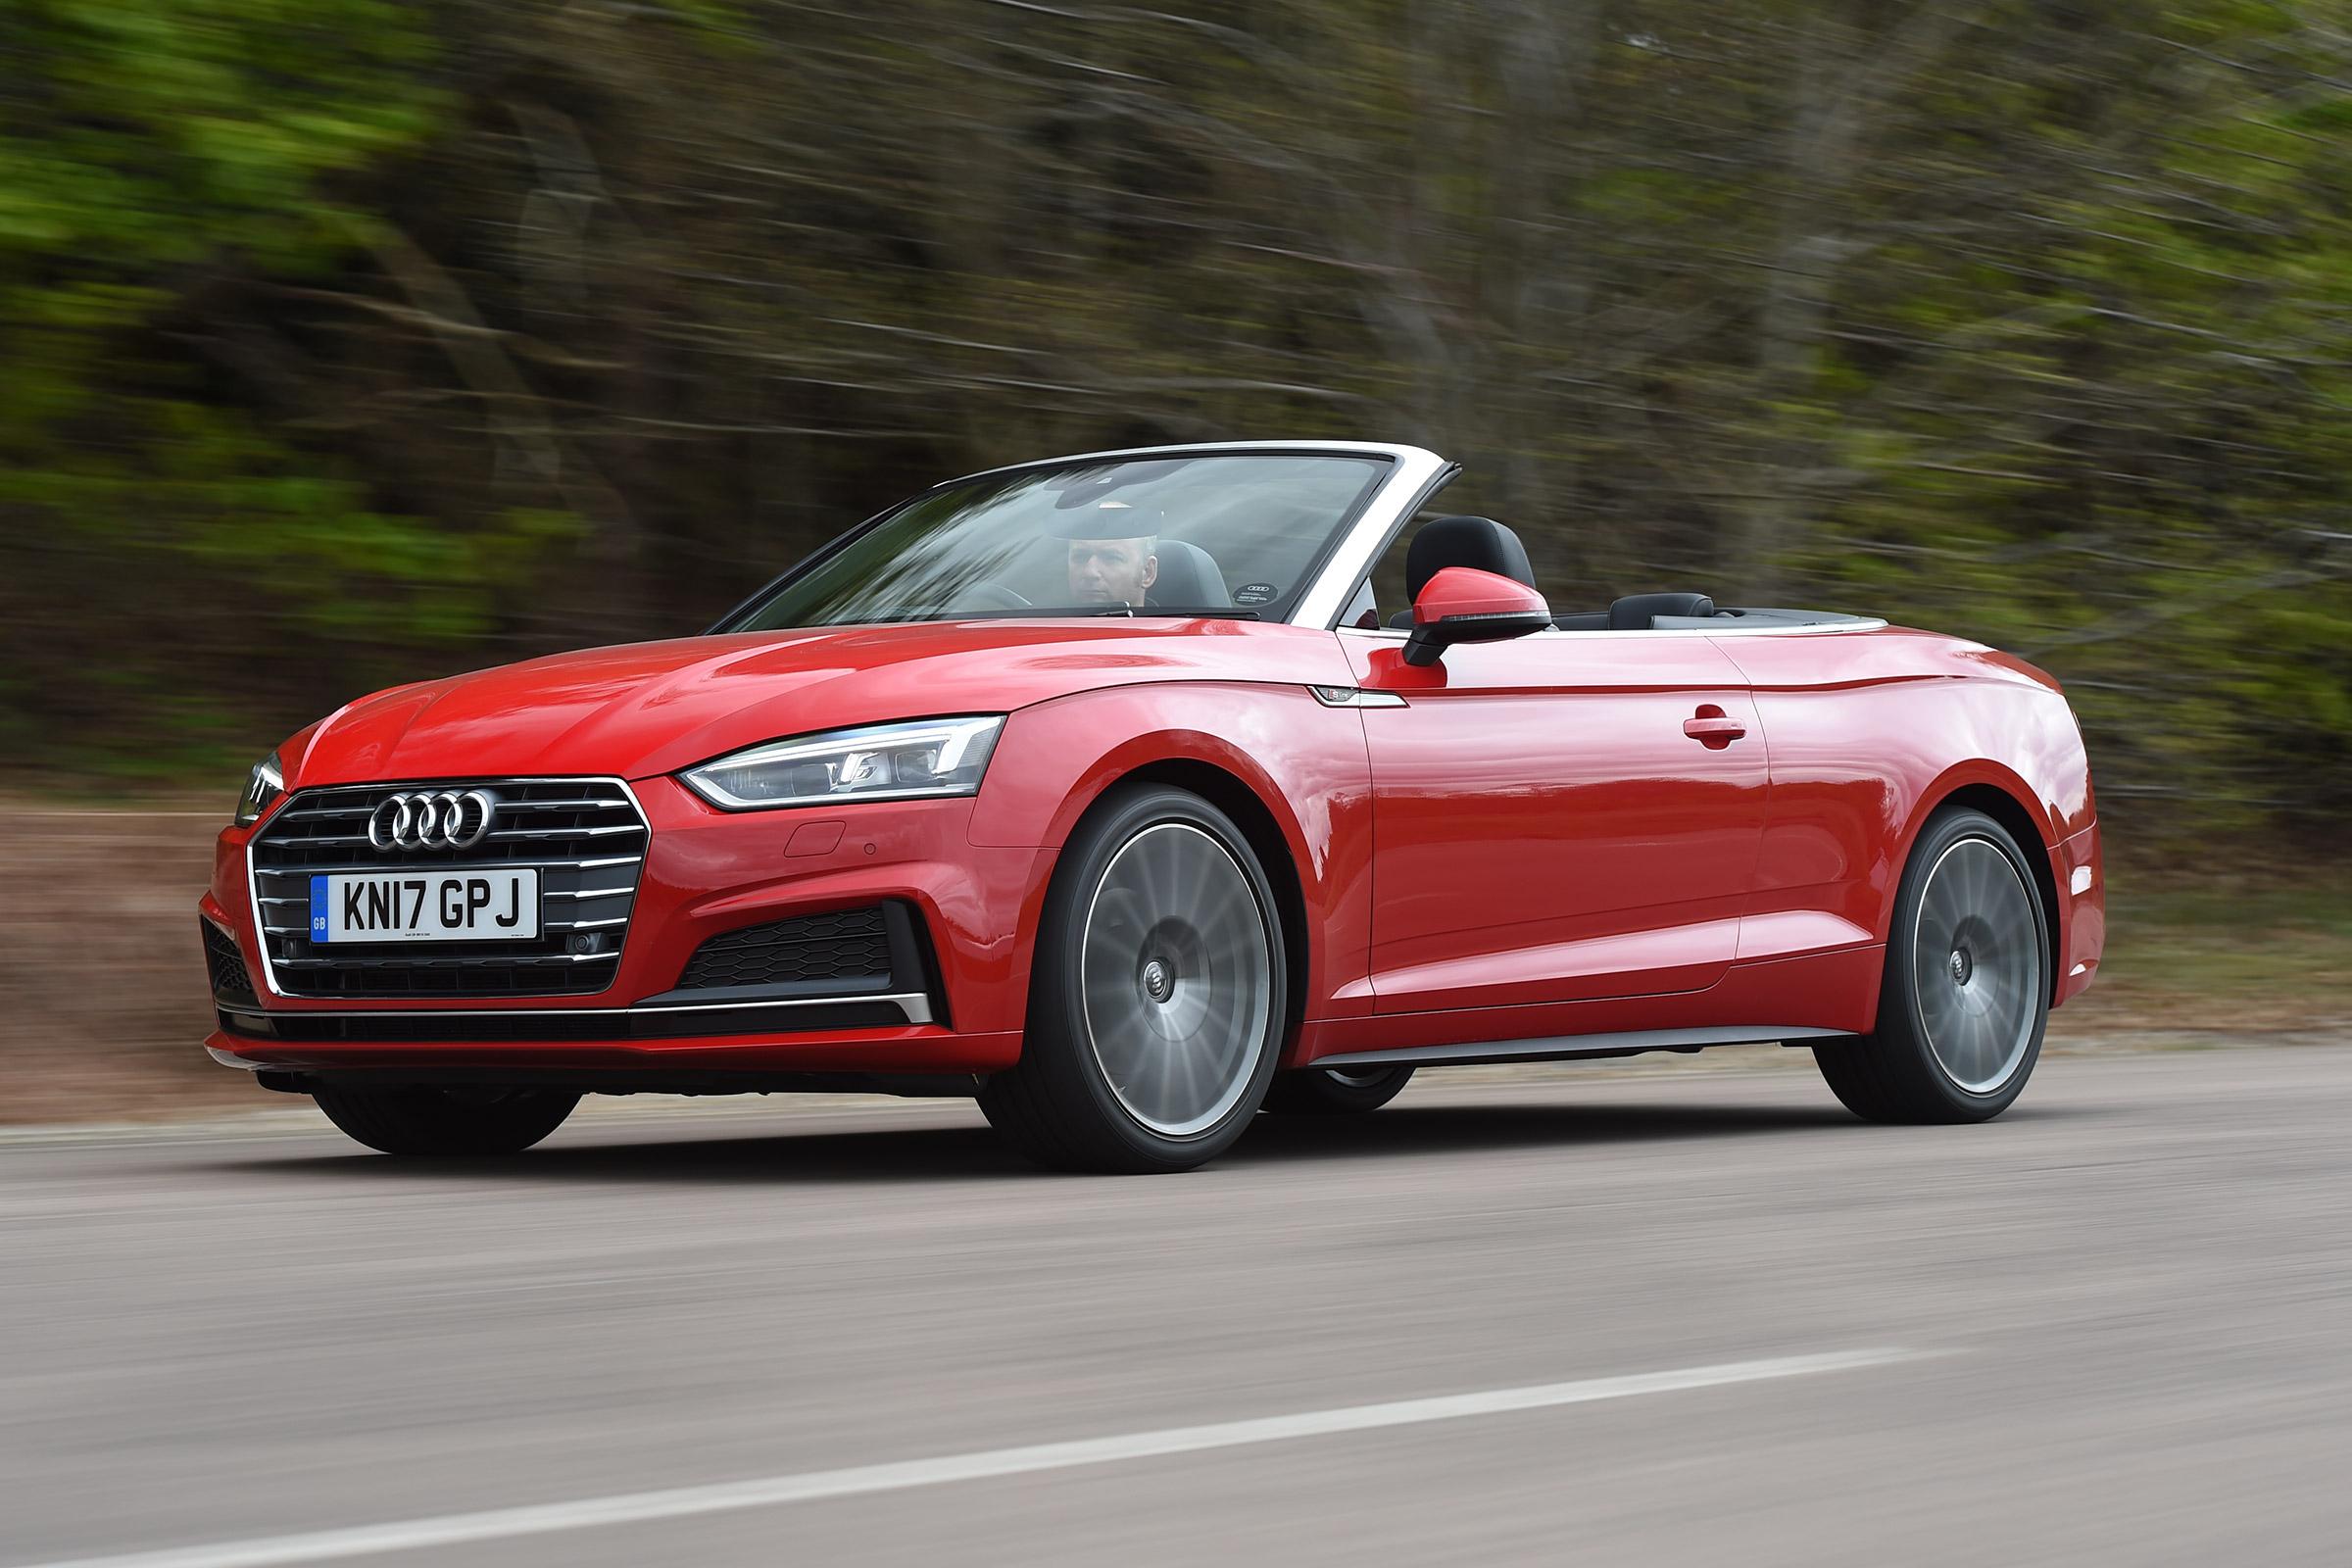 Audi A5 Cabriolet Best Convertibles Auto Express